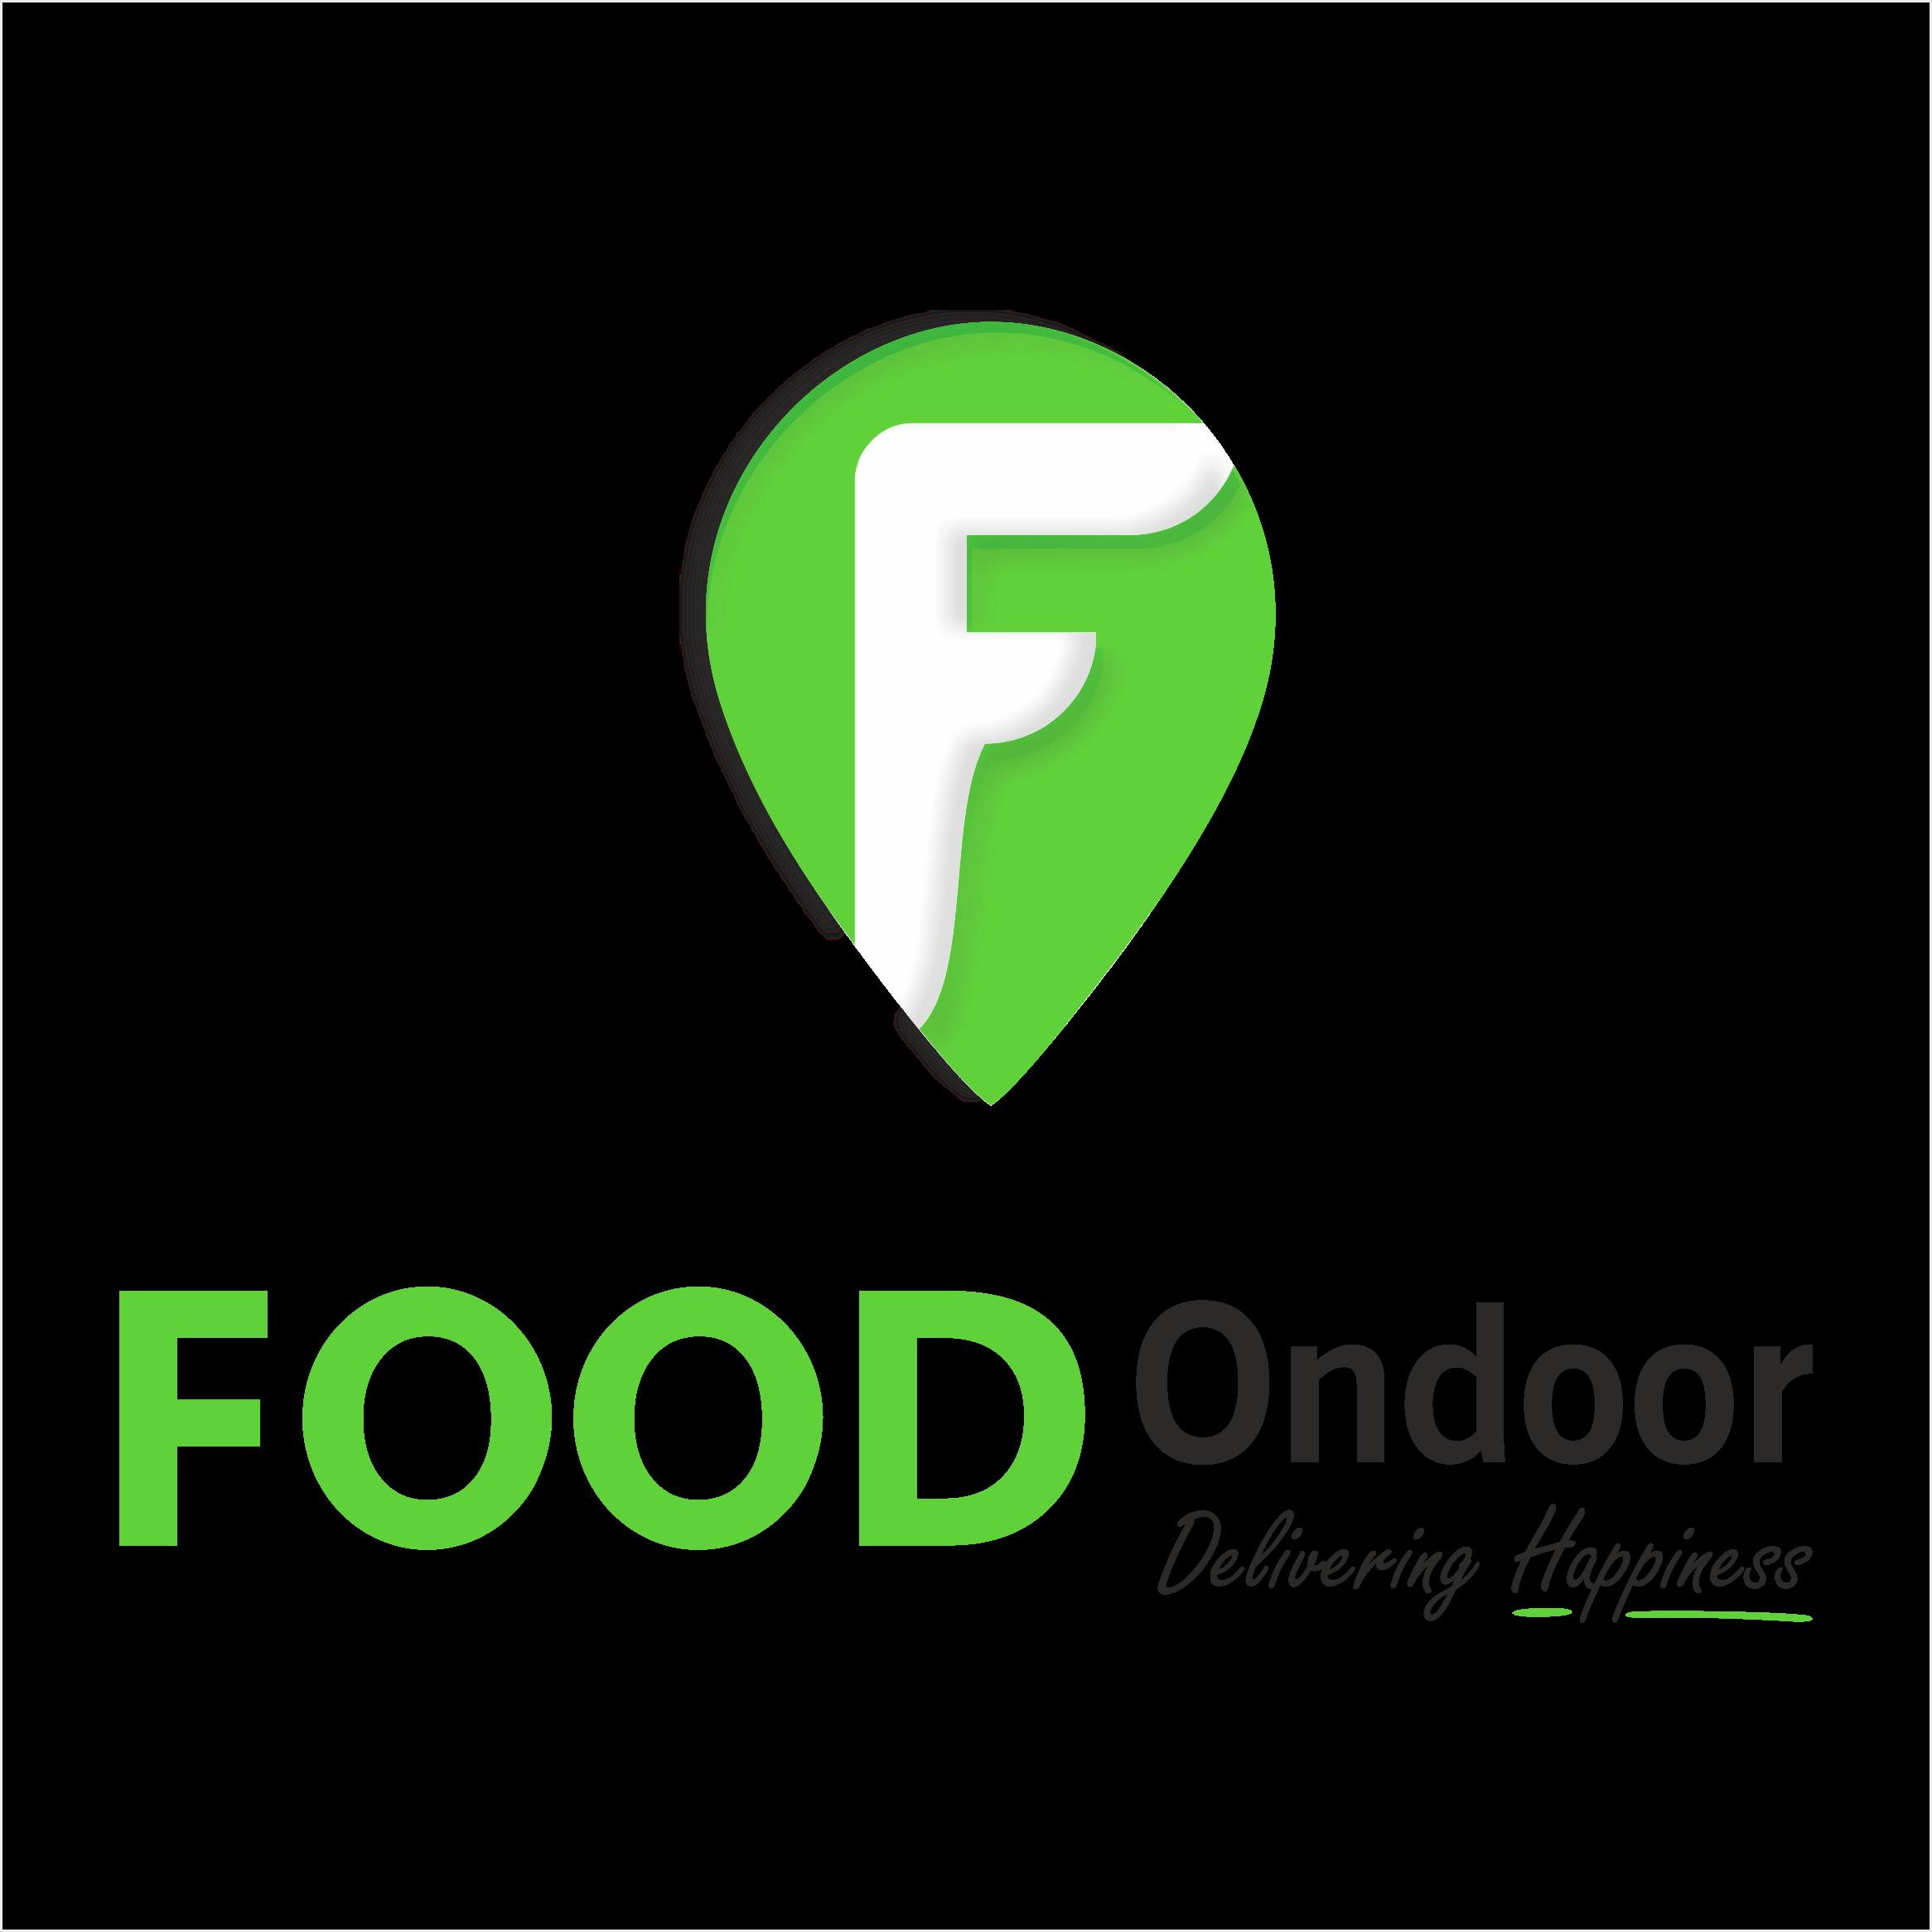 FoodOndoor logo